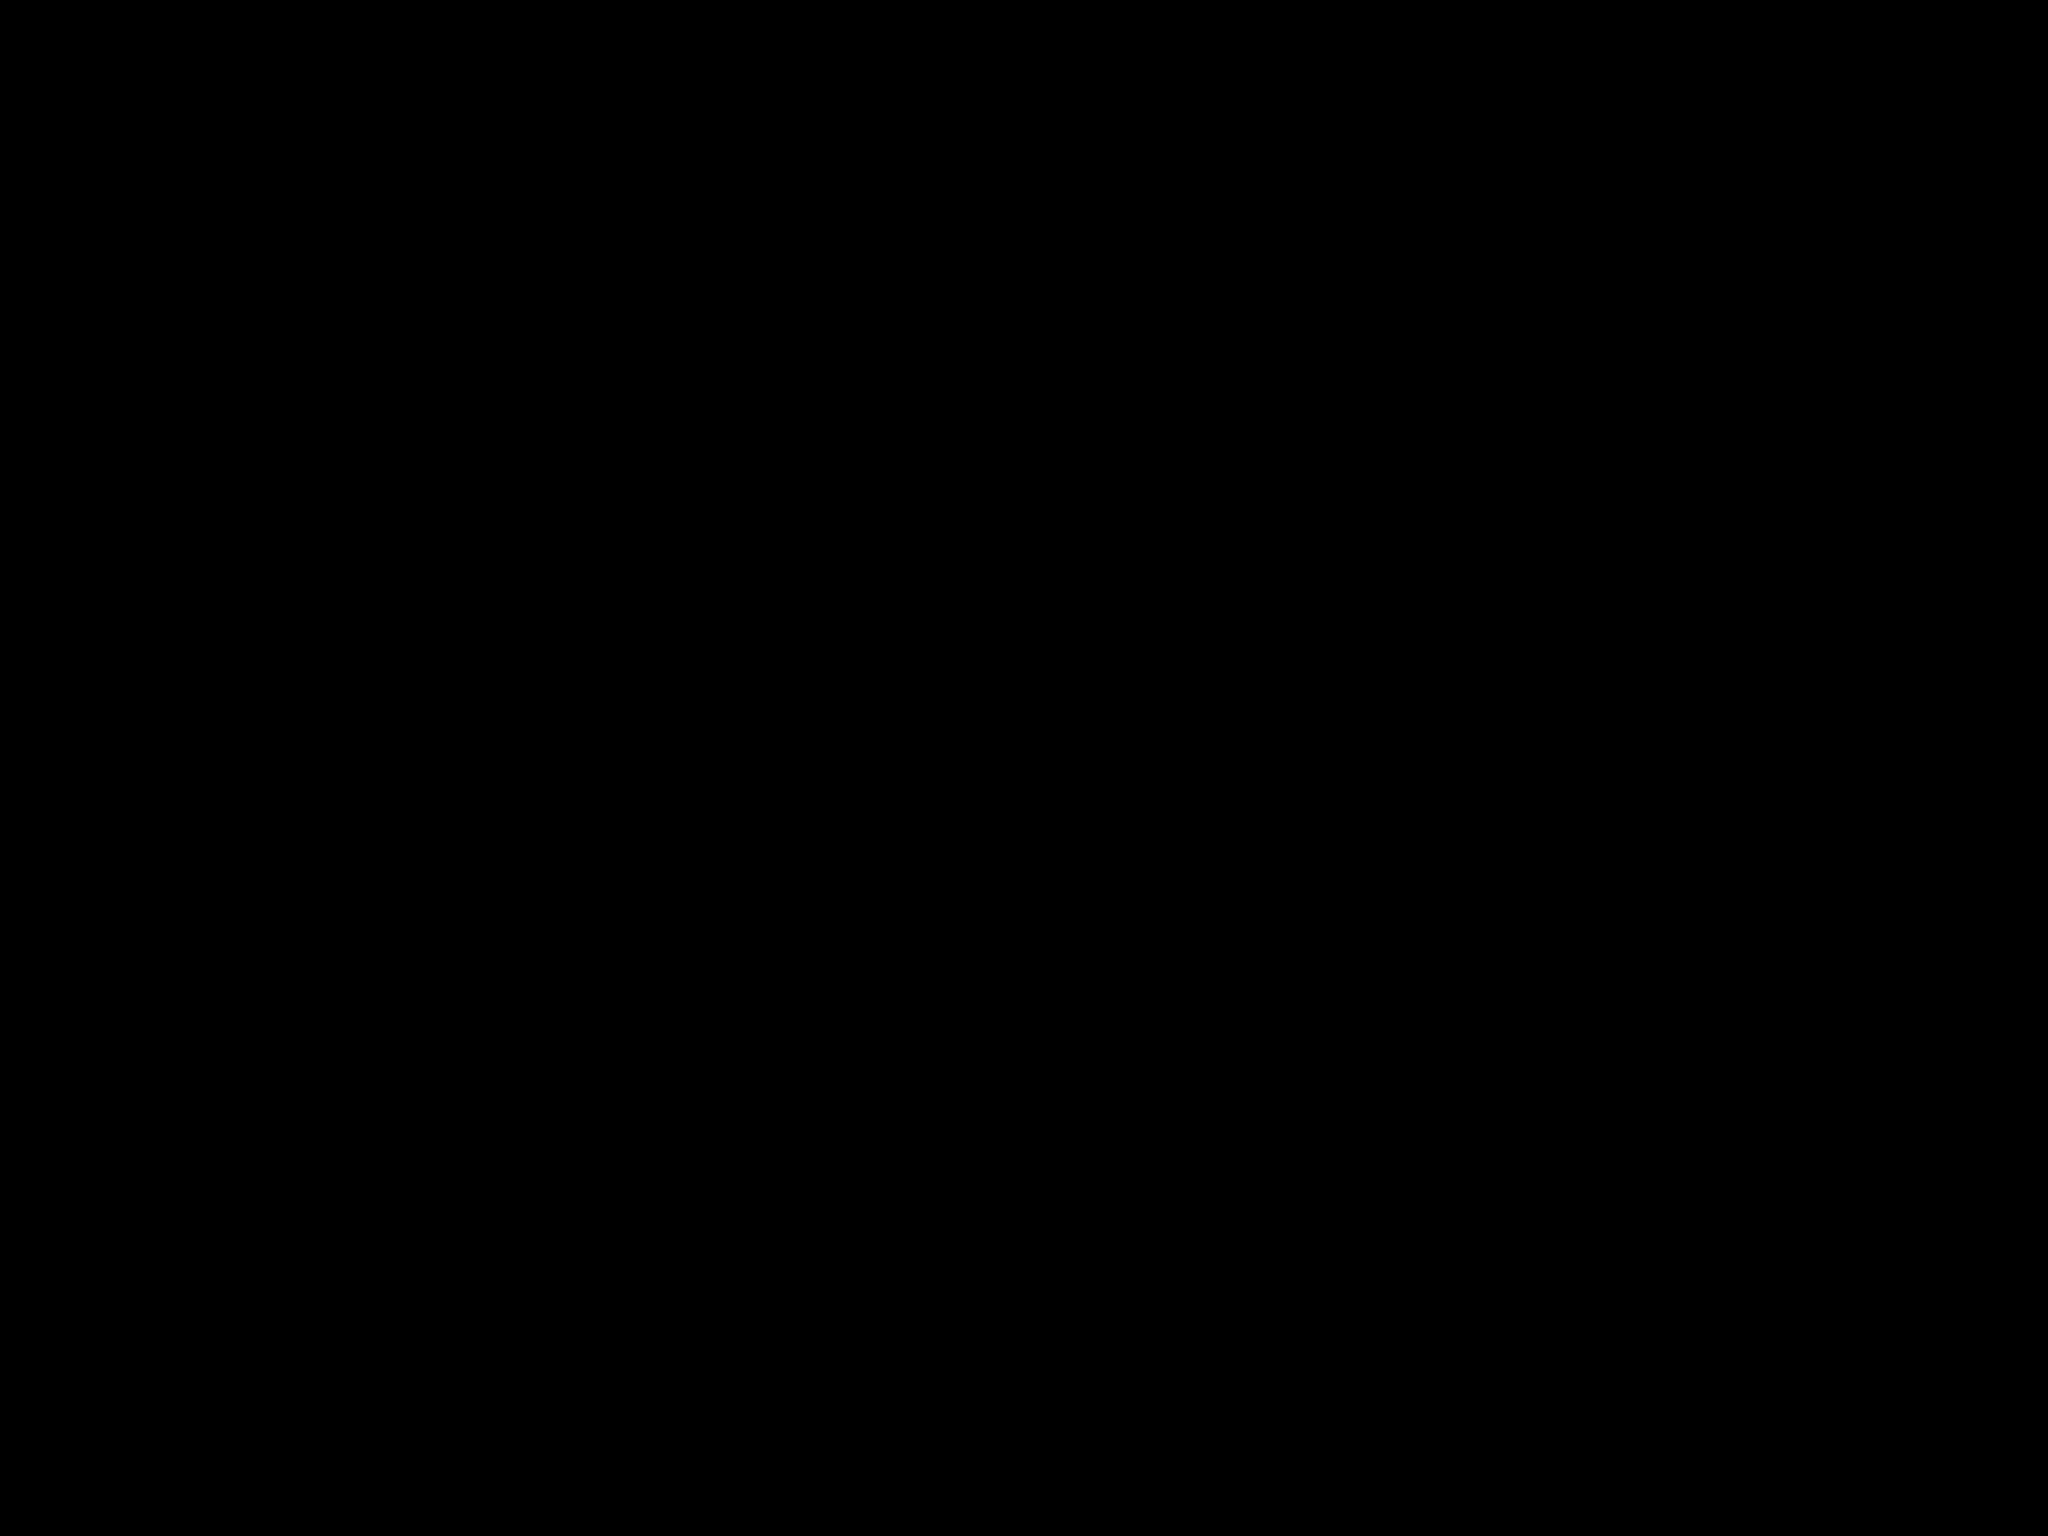 Fotogalerie Kigaabschluss 2018